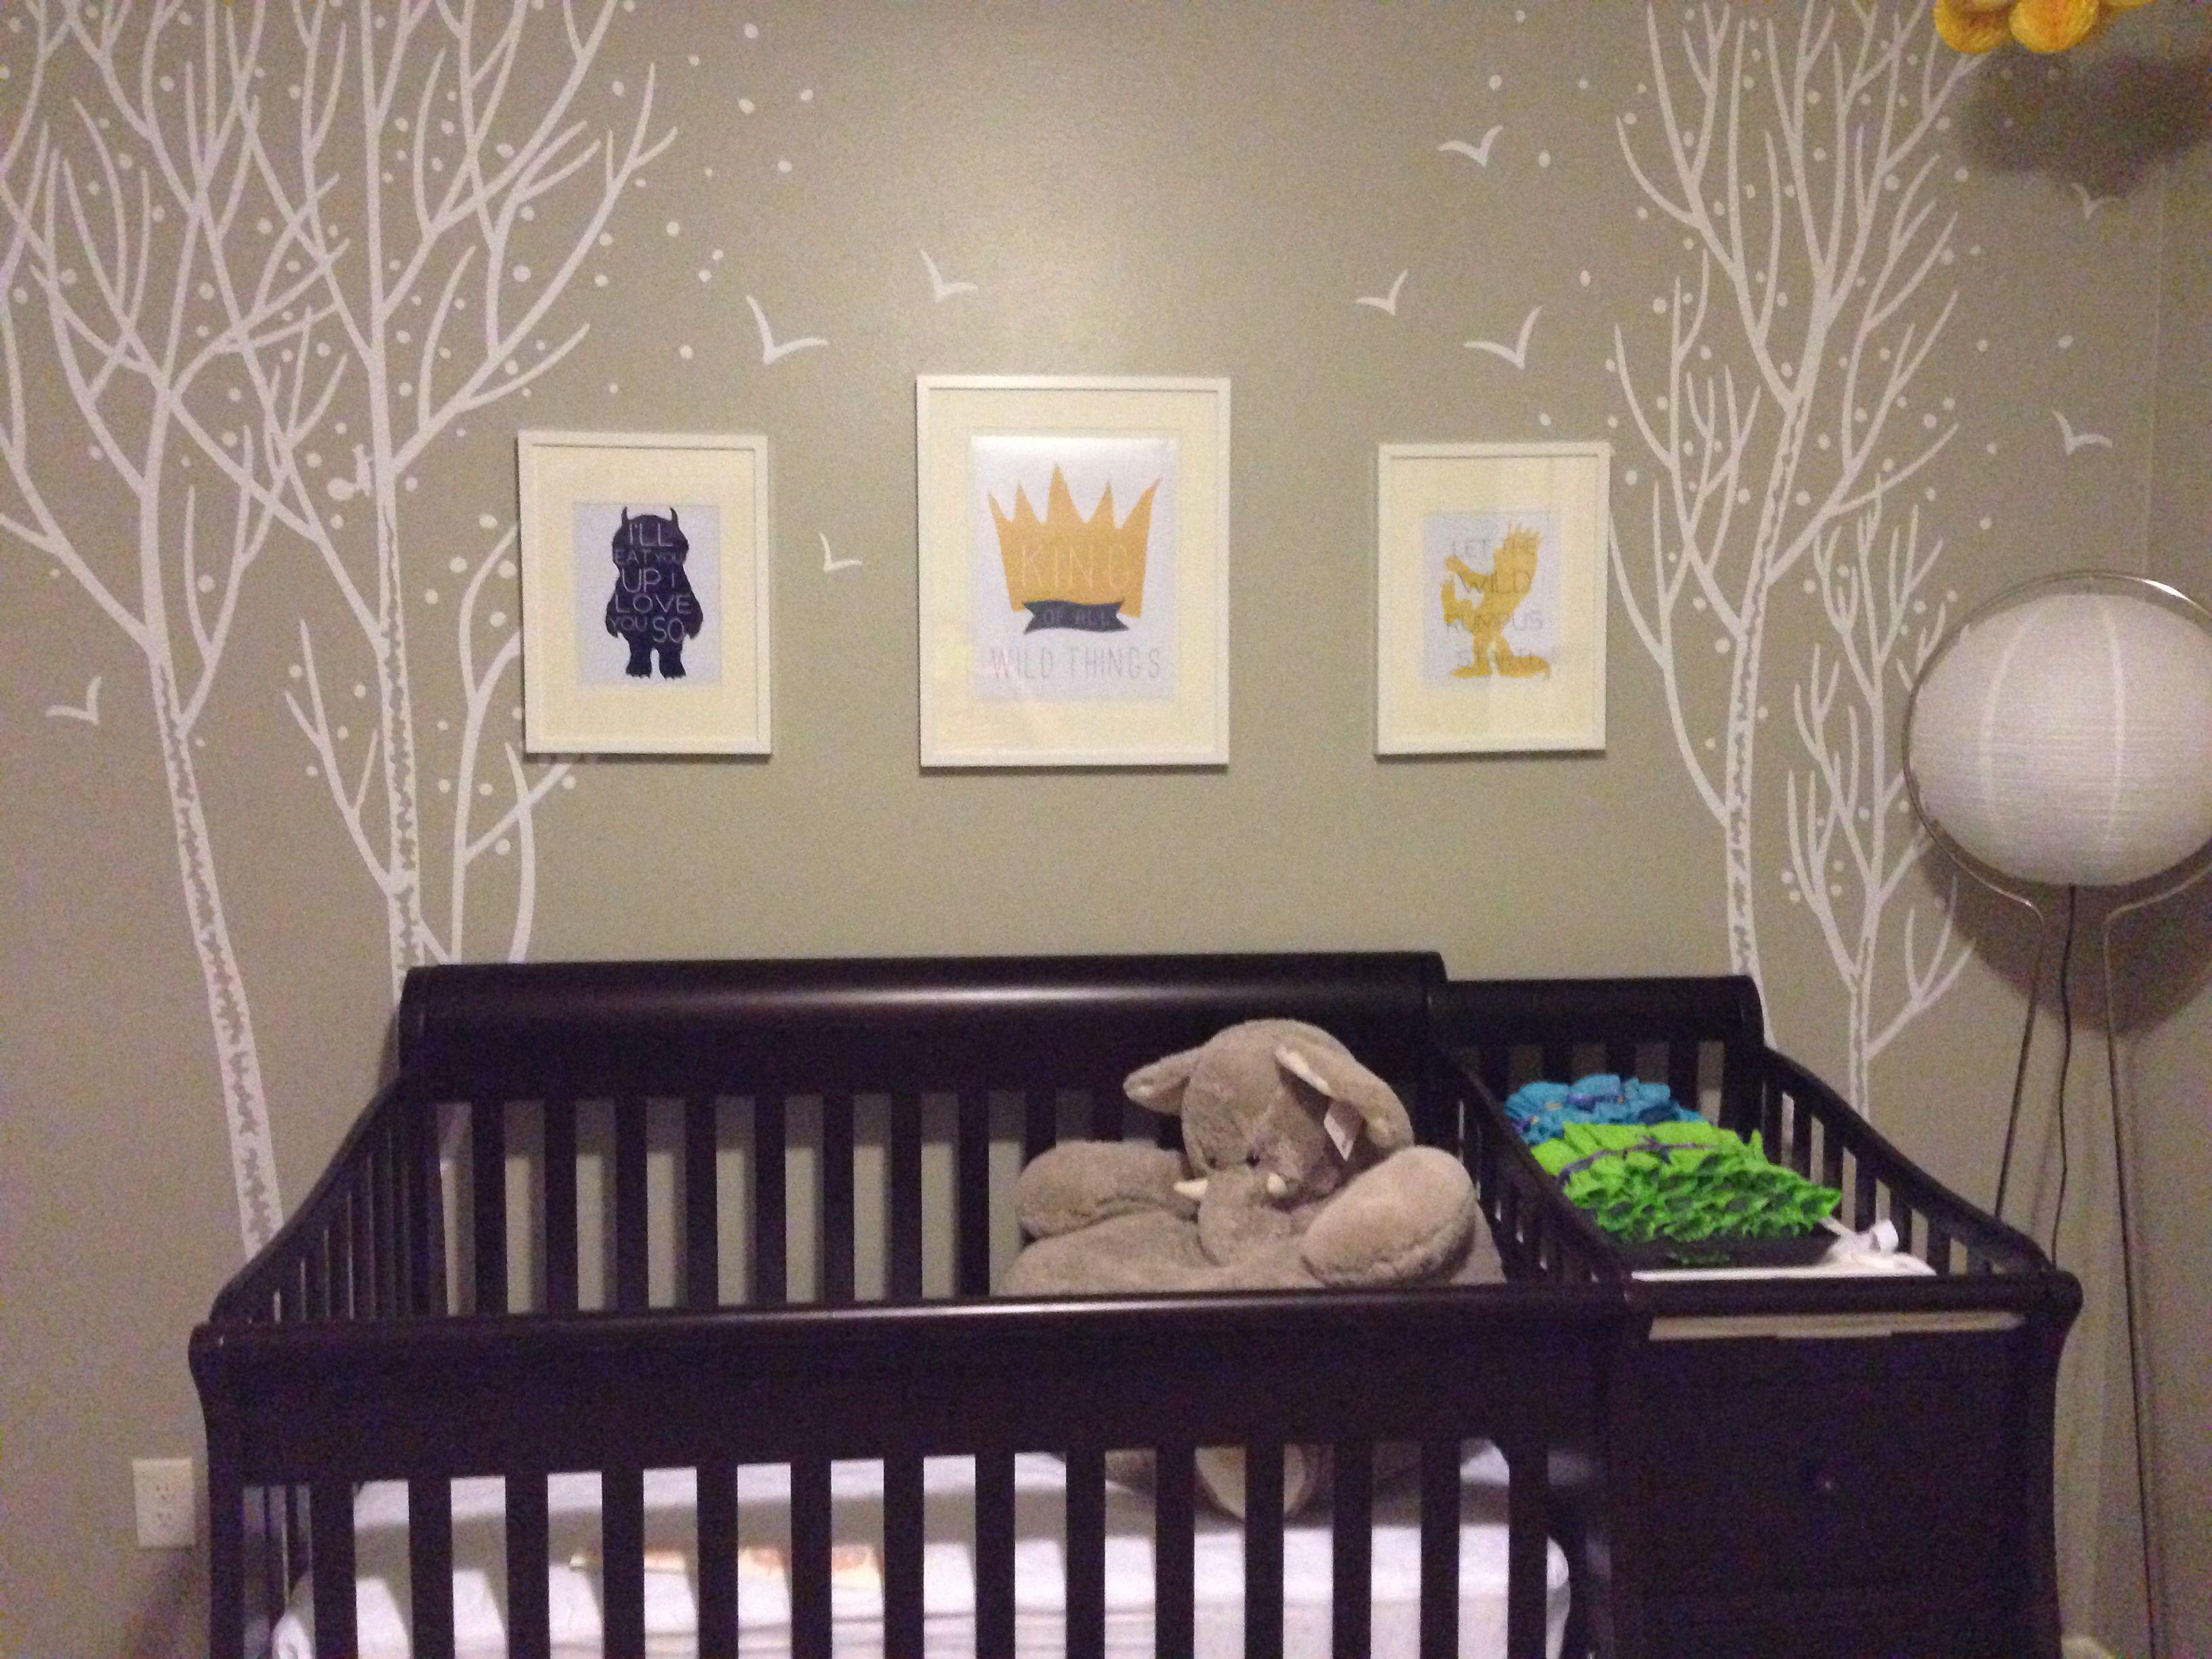 Where The Wild Things Are Nursery